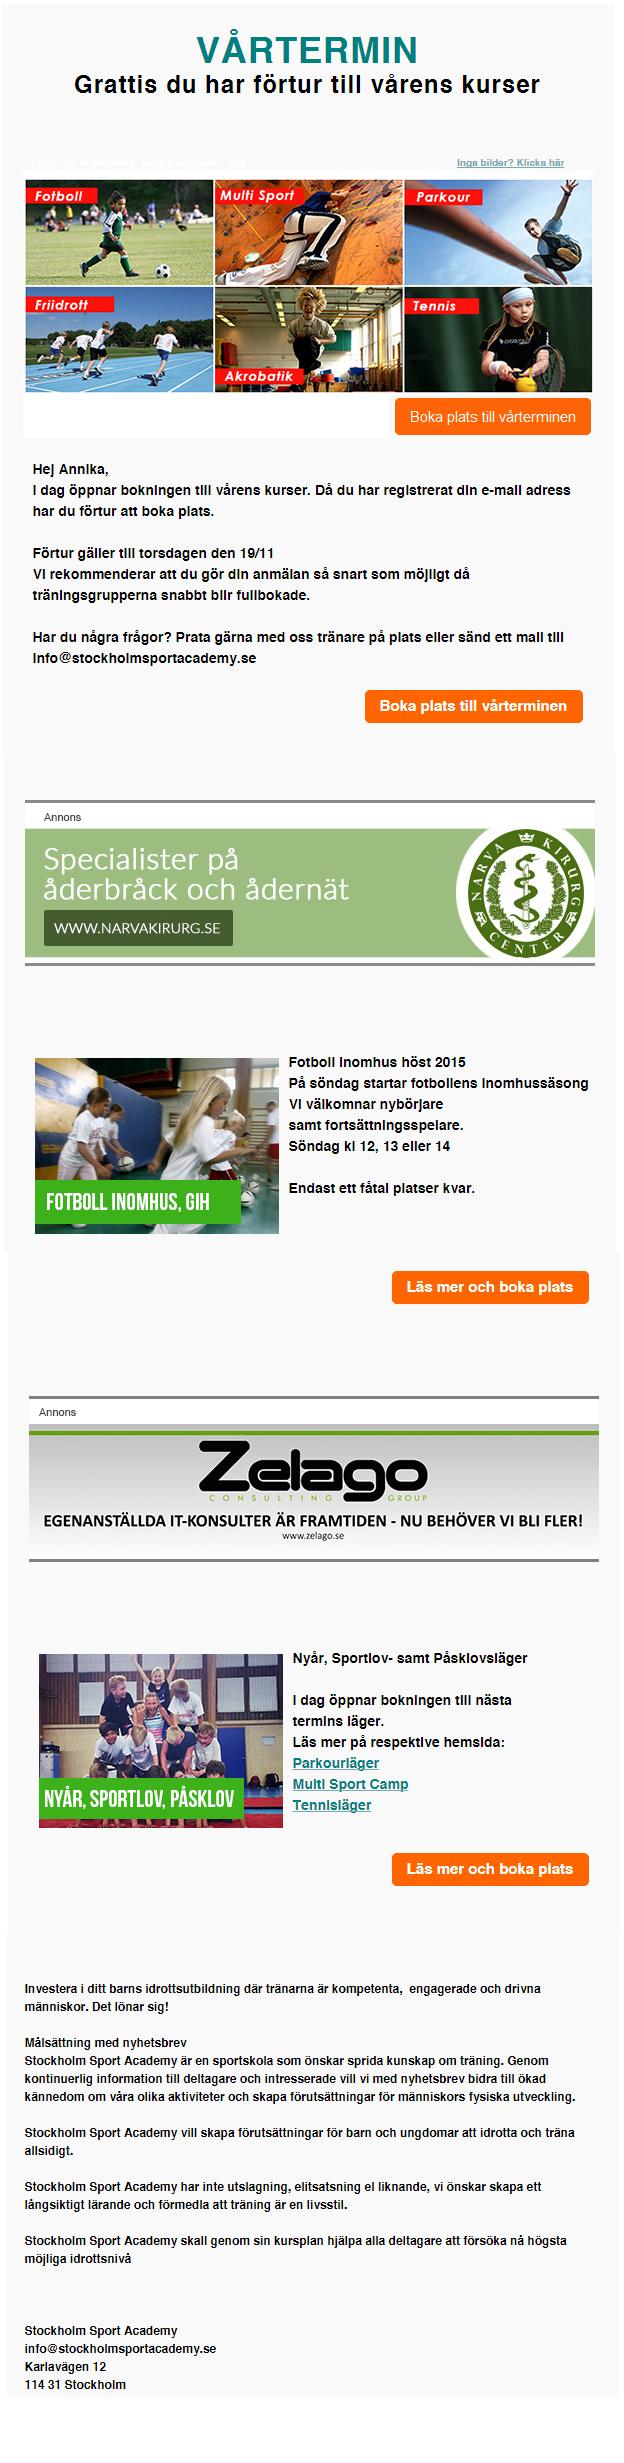 Nyhetsbrev Stockholm Sport Academy